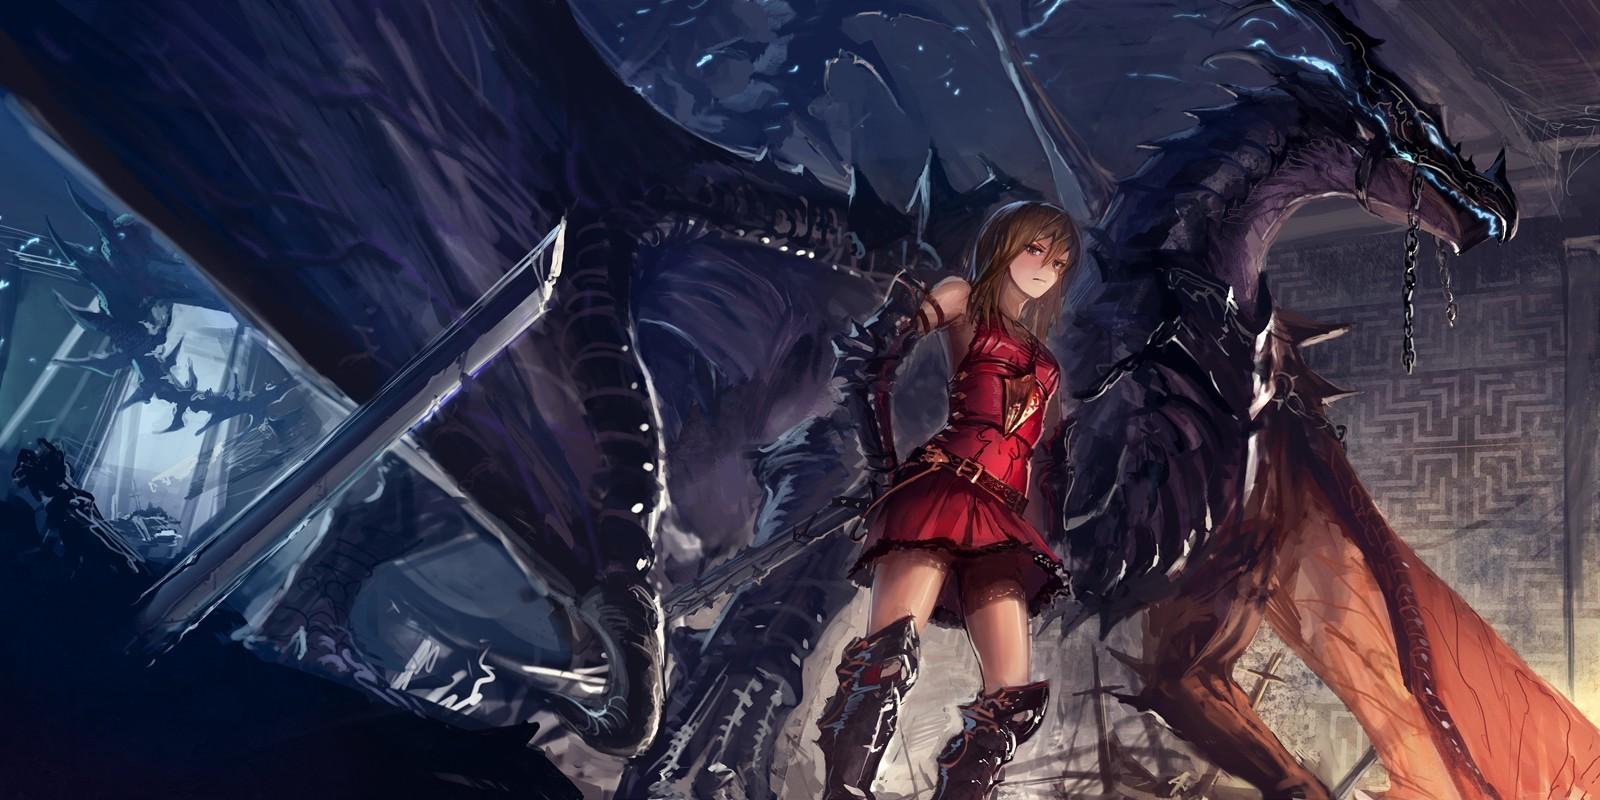 Drachen Anime